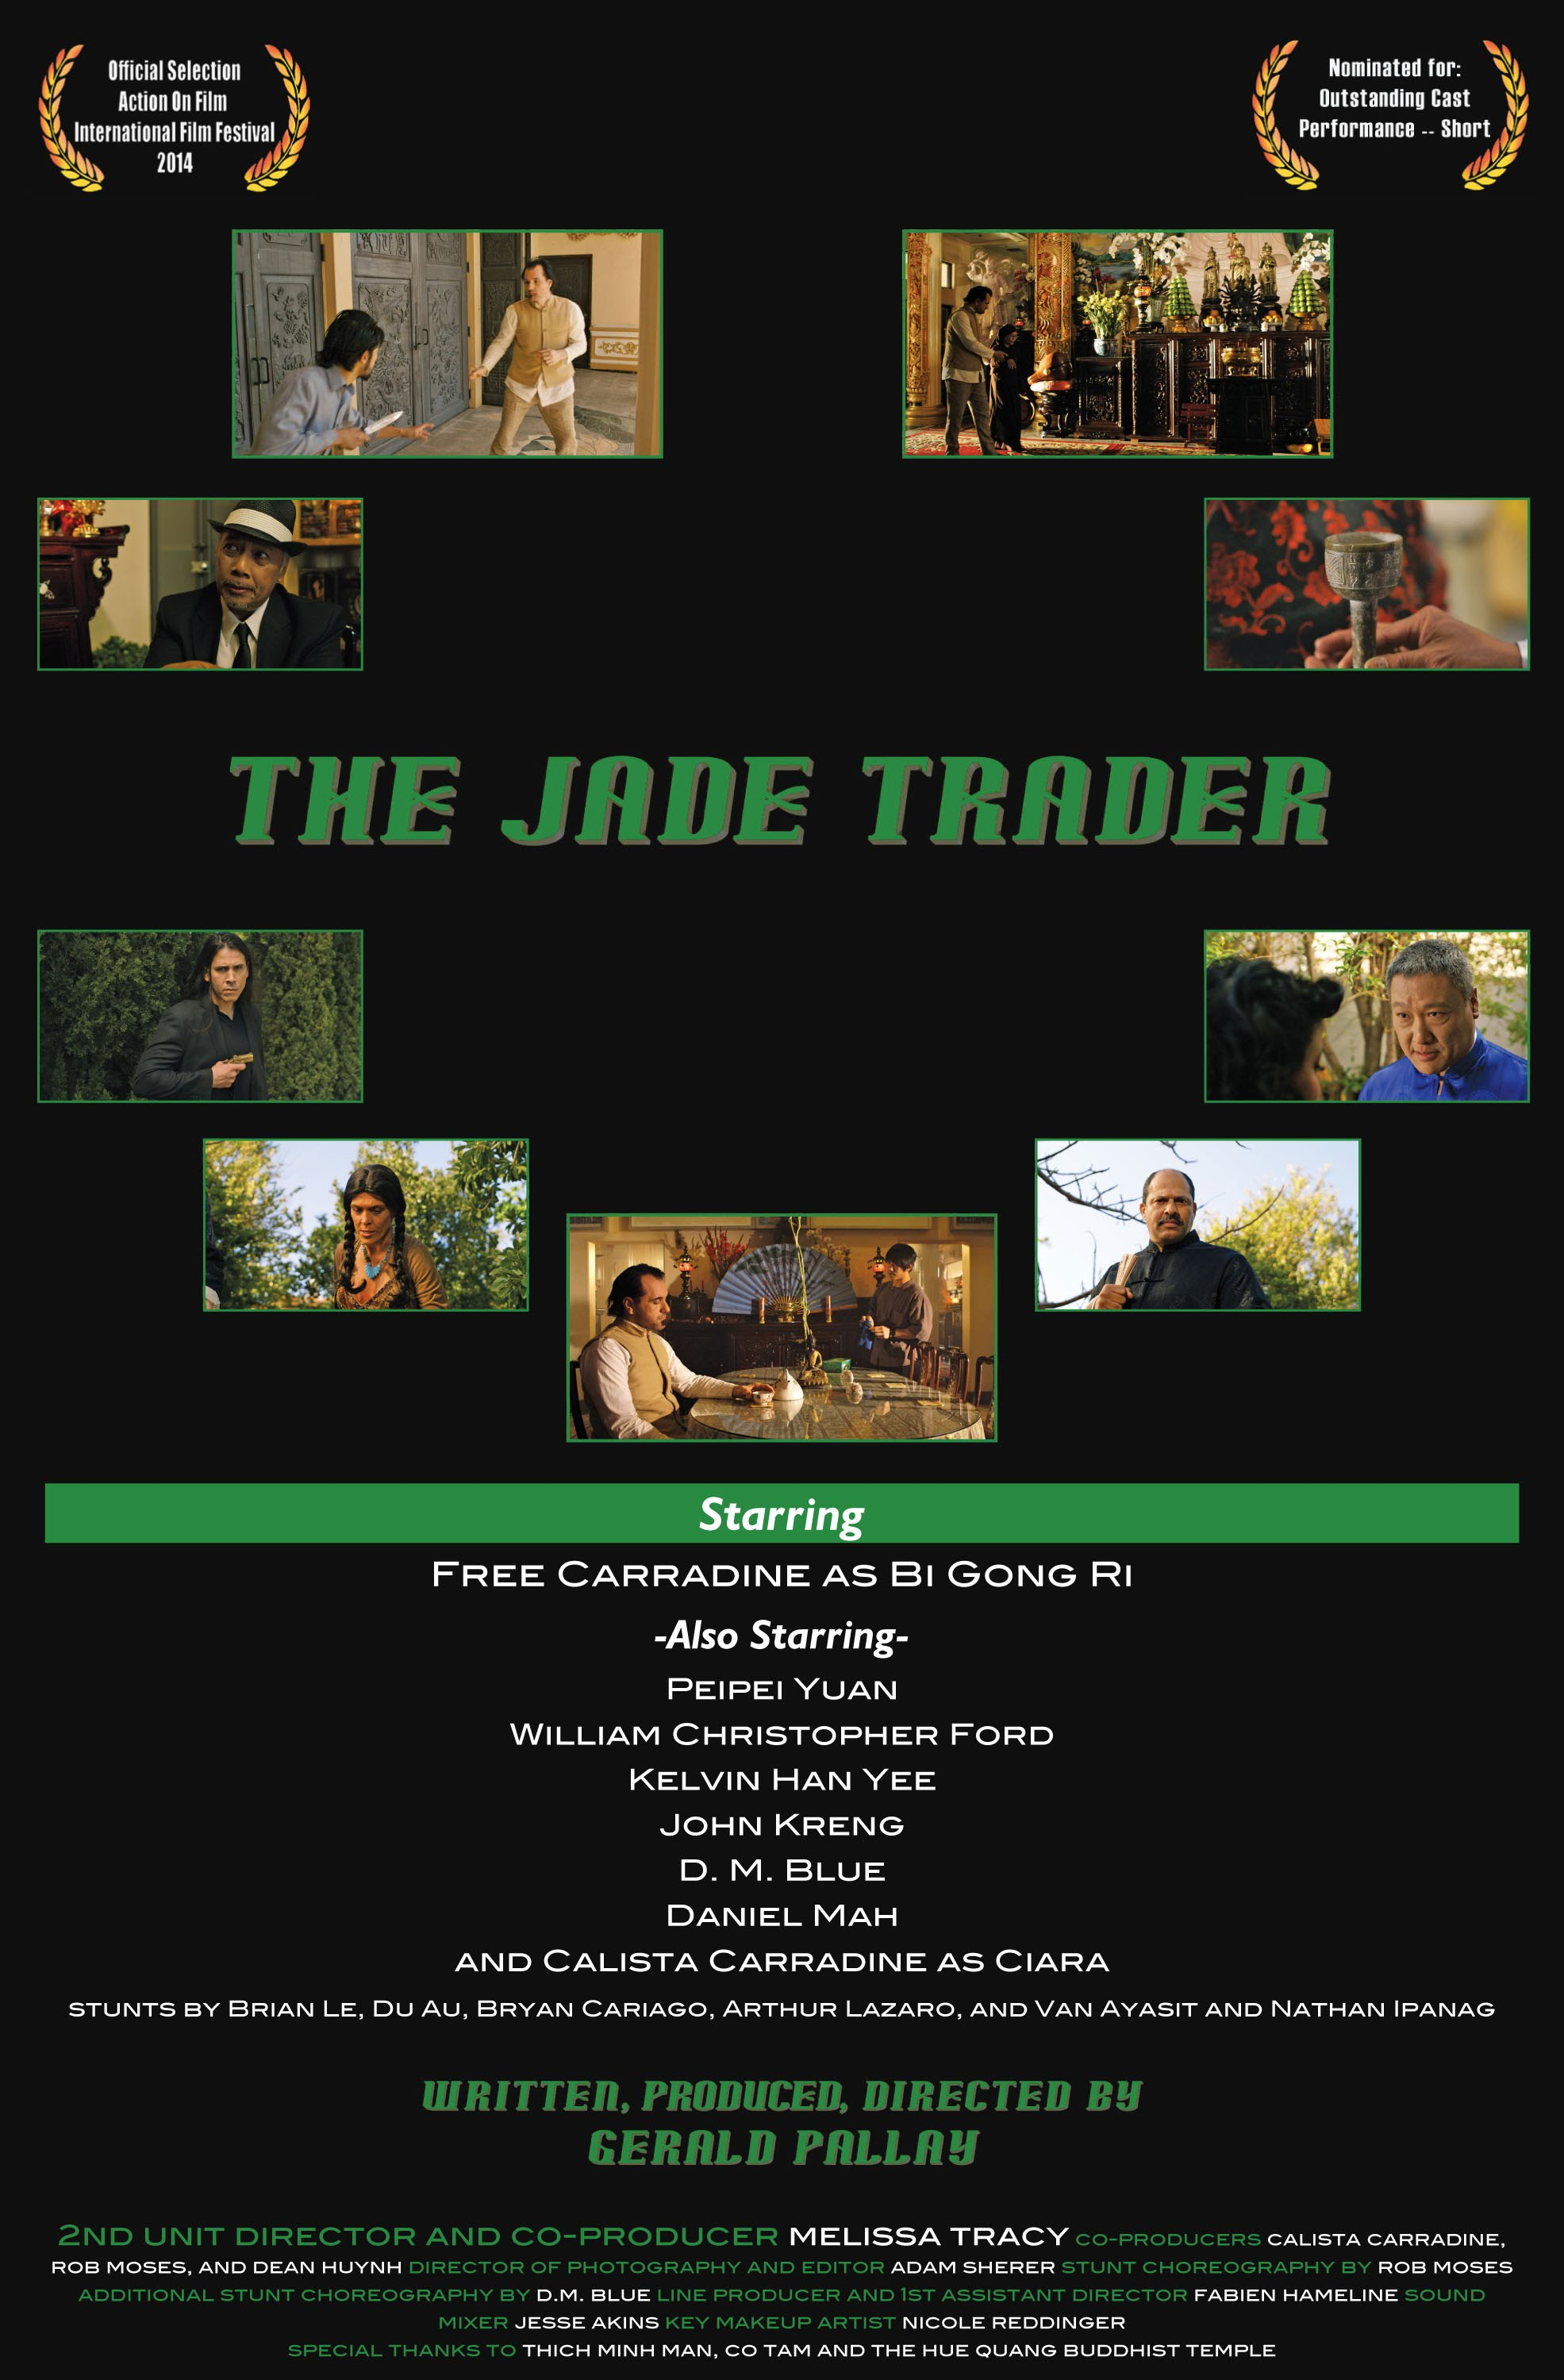 The Jade Trader